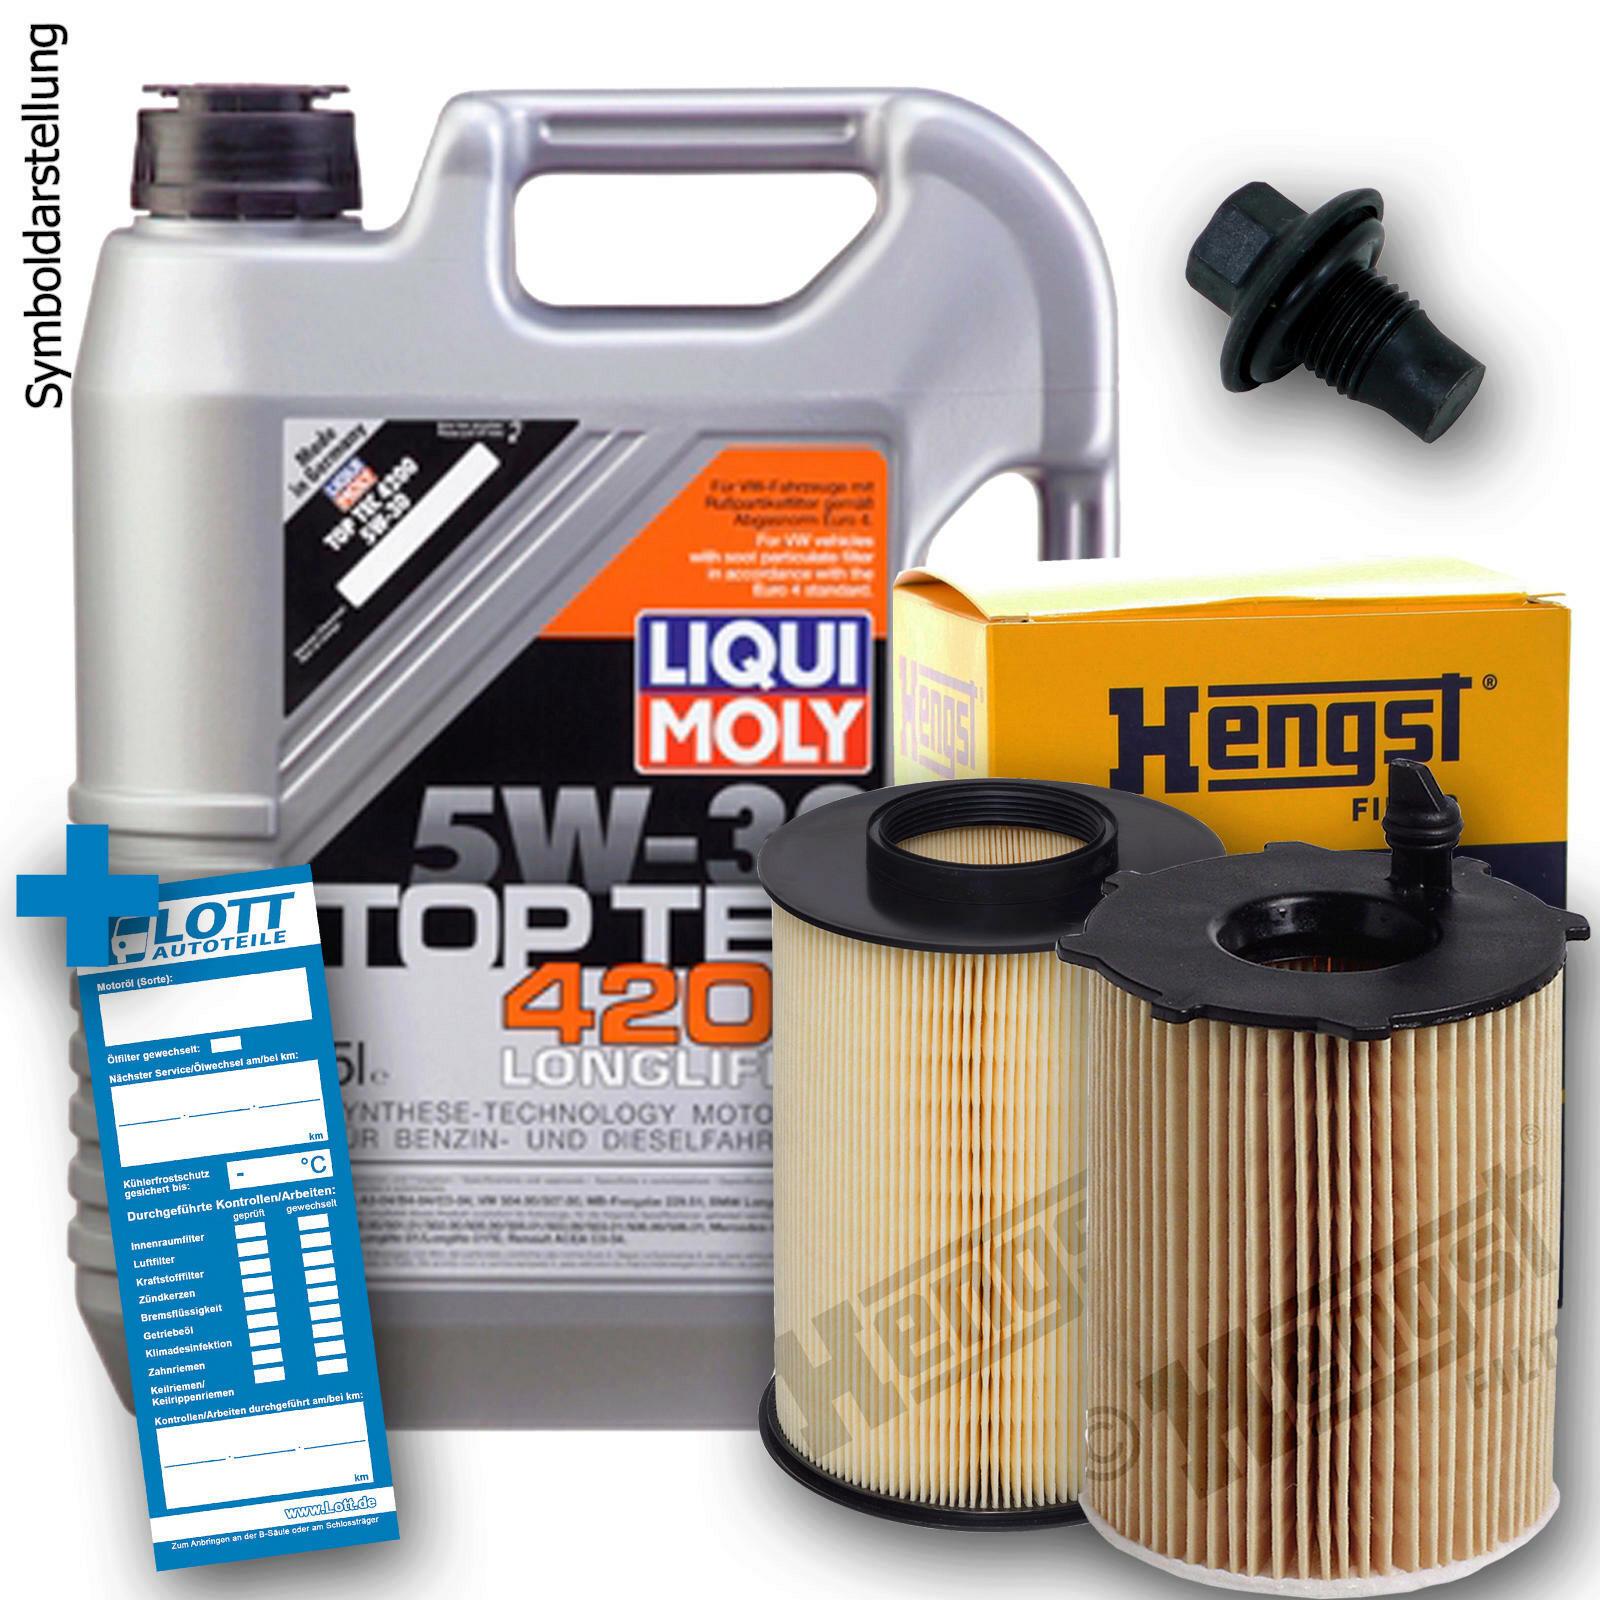 Liqui Moly Motoröl + Ölfilter + Luftfilter + Ablassschraube